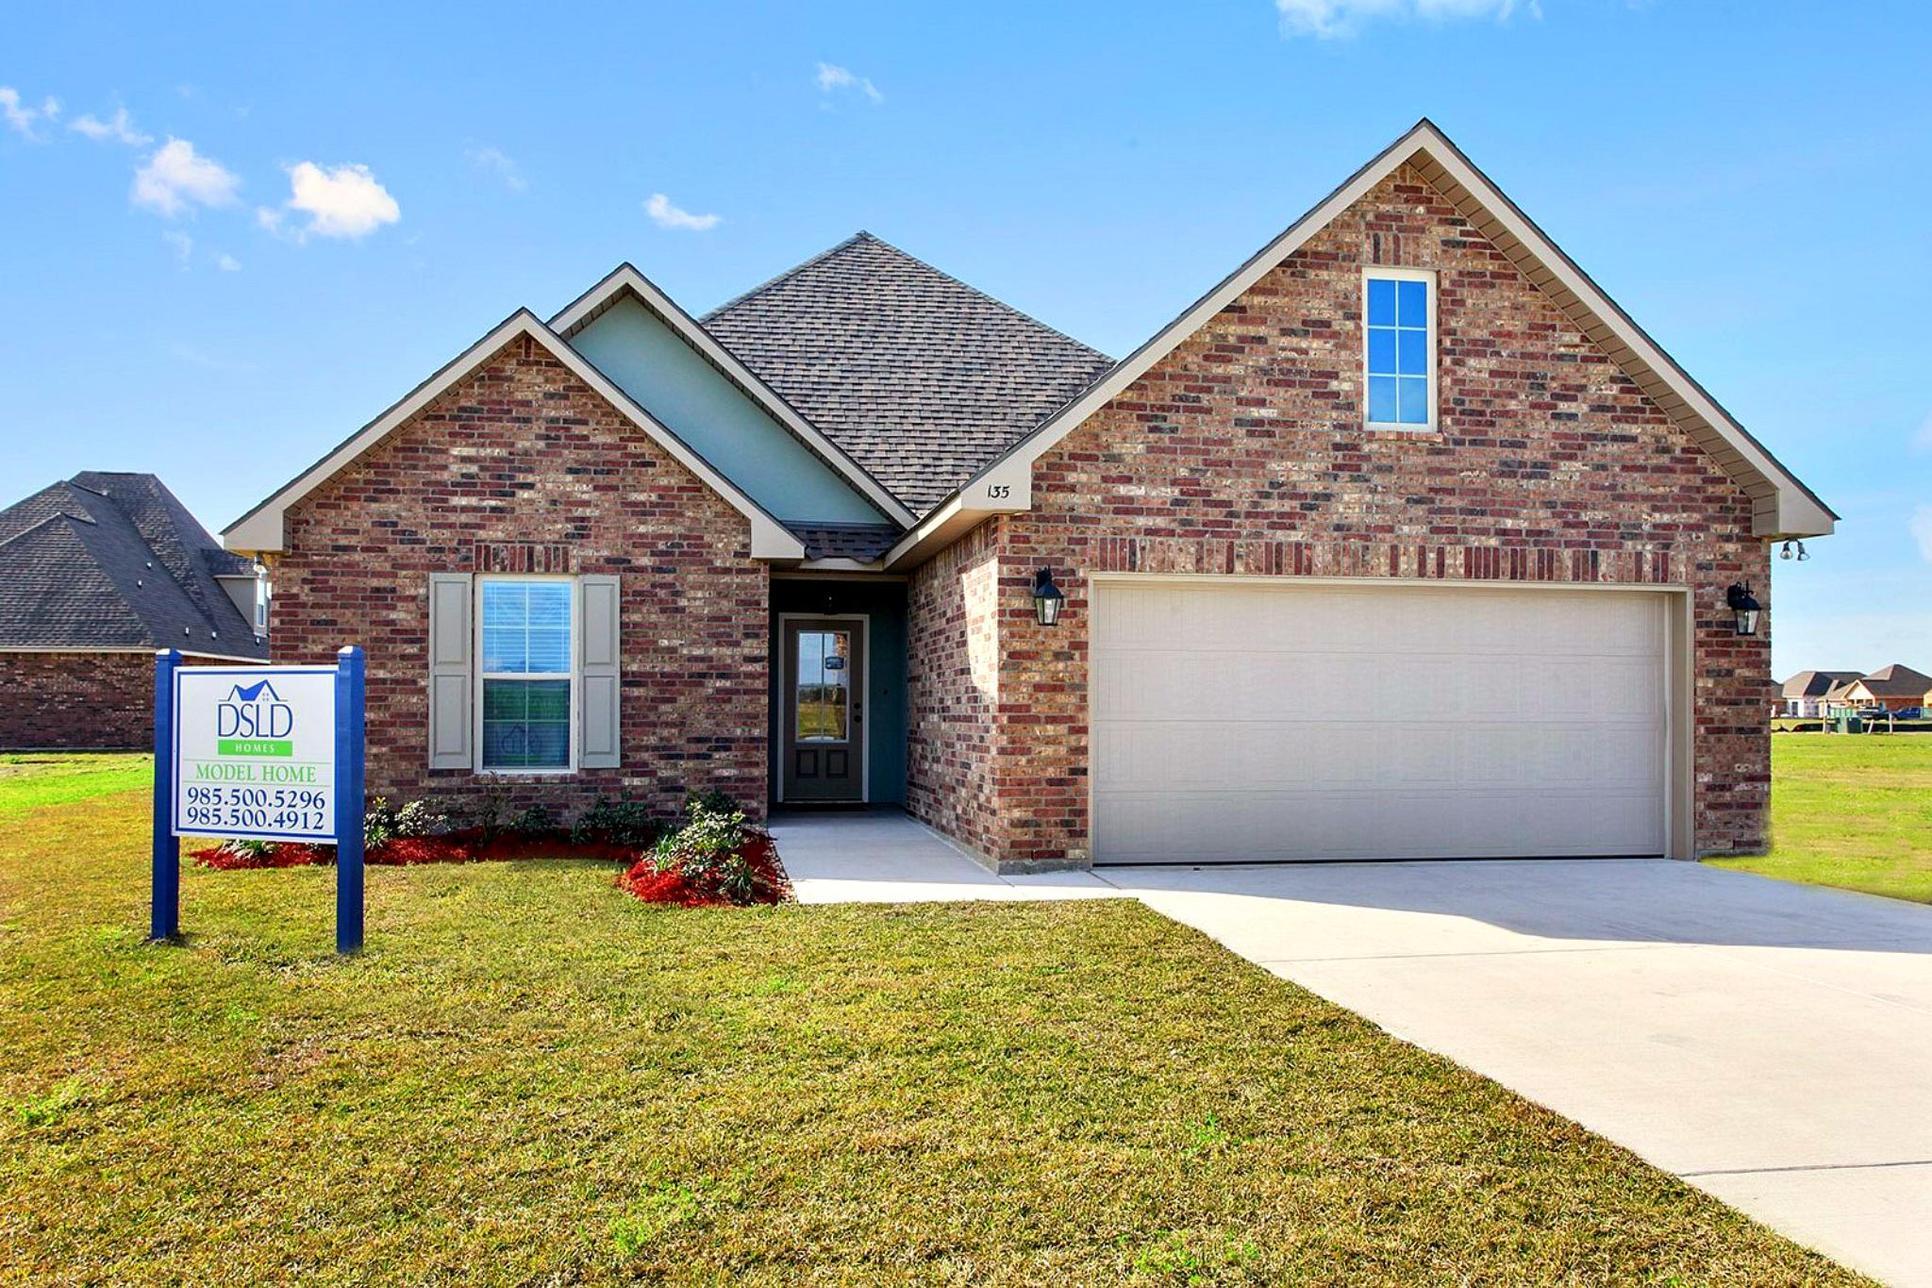 King George Estates Model Home Exterior - King George Estates Community - DSLD Homes - Thibodaux